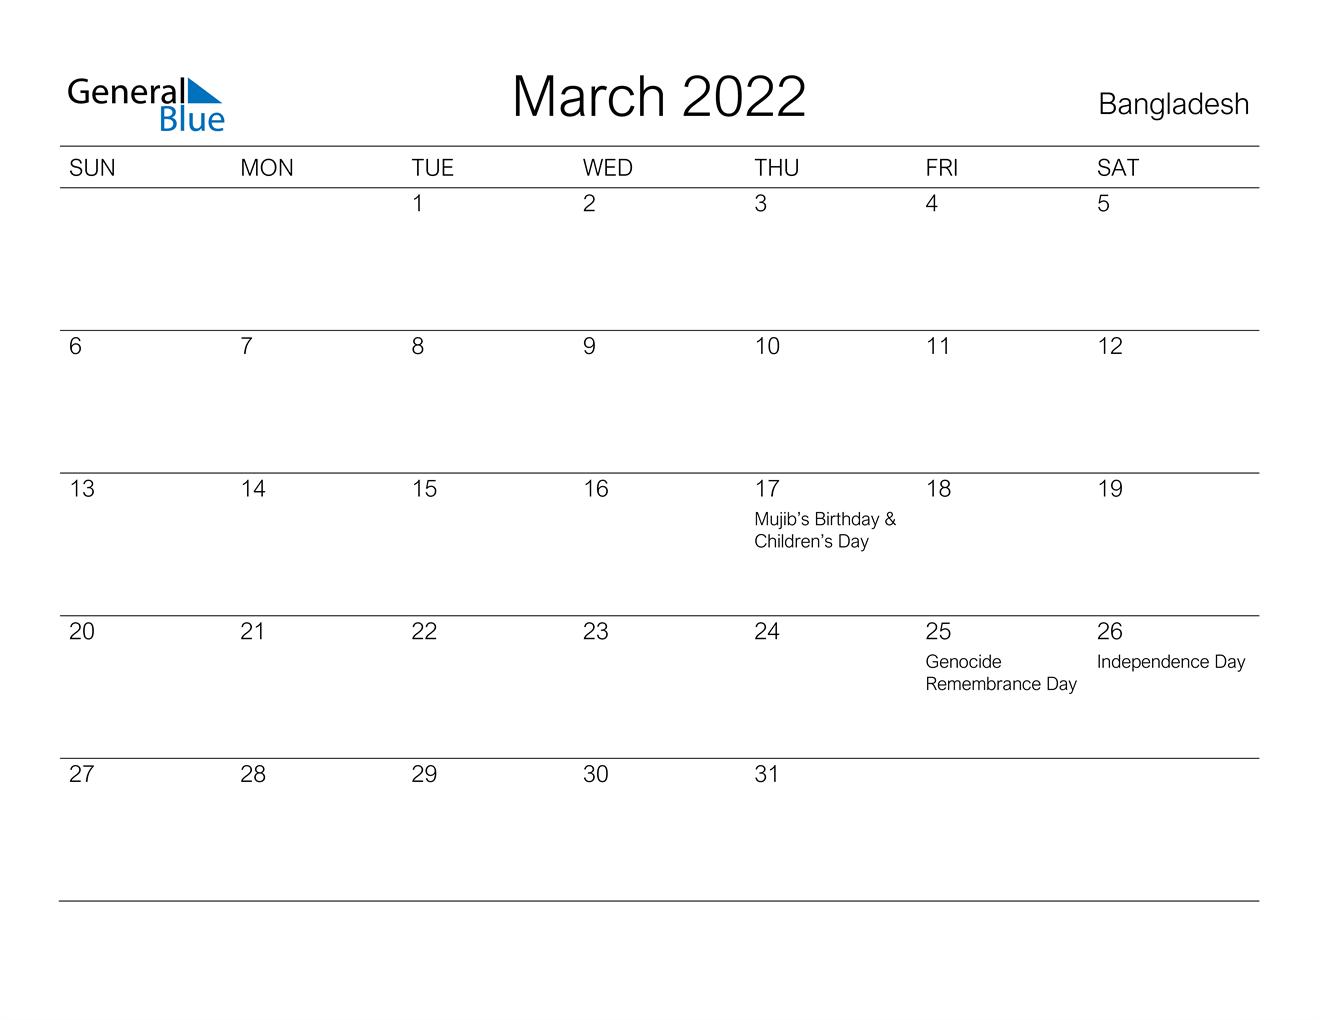 March 2022 Calendar - Bangladesh